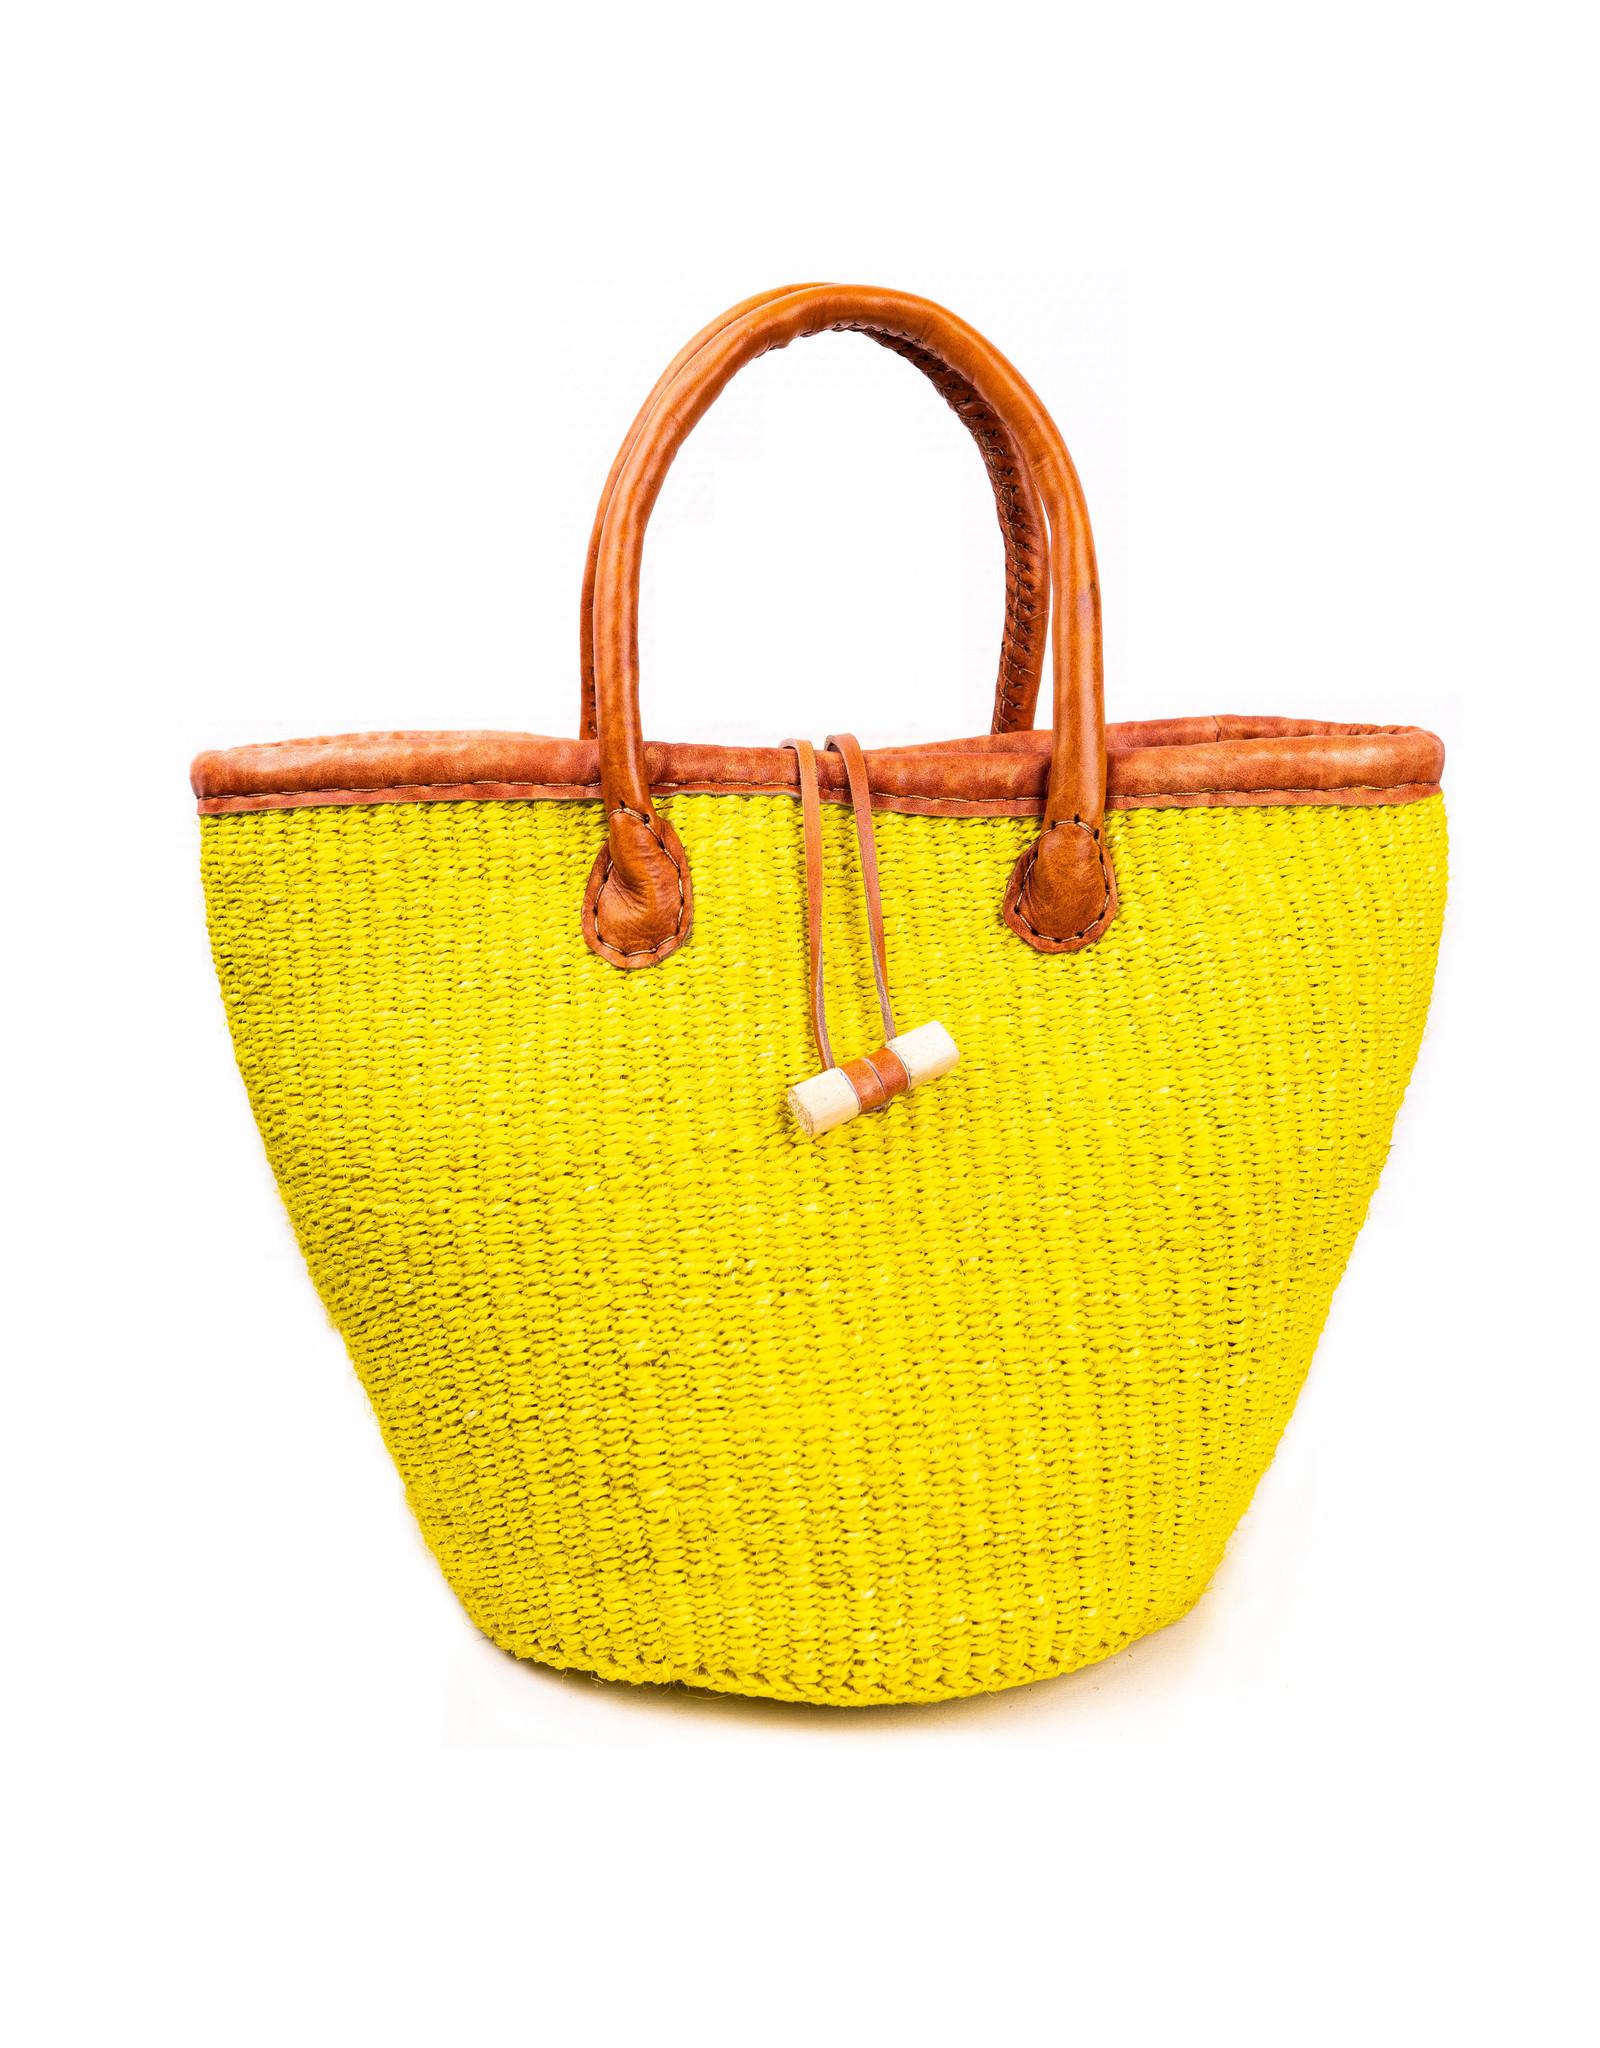 Maisha.Style Taita handbasket - happy yellow